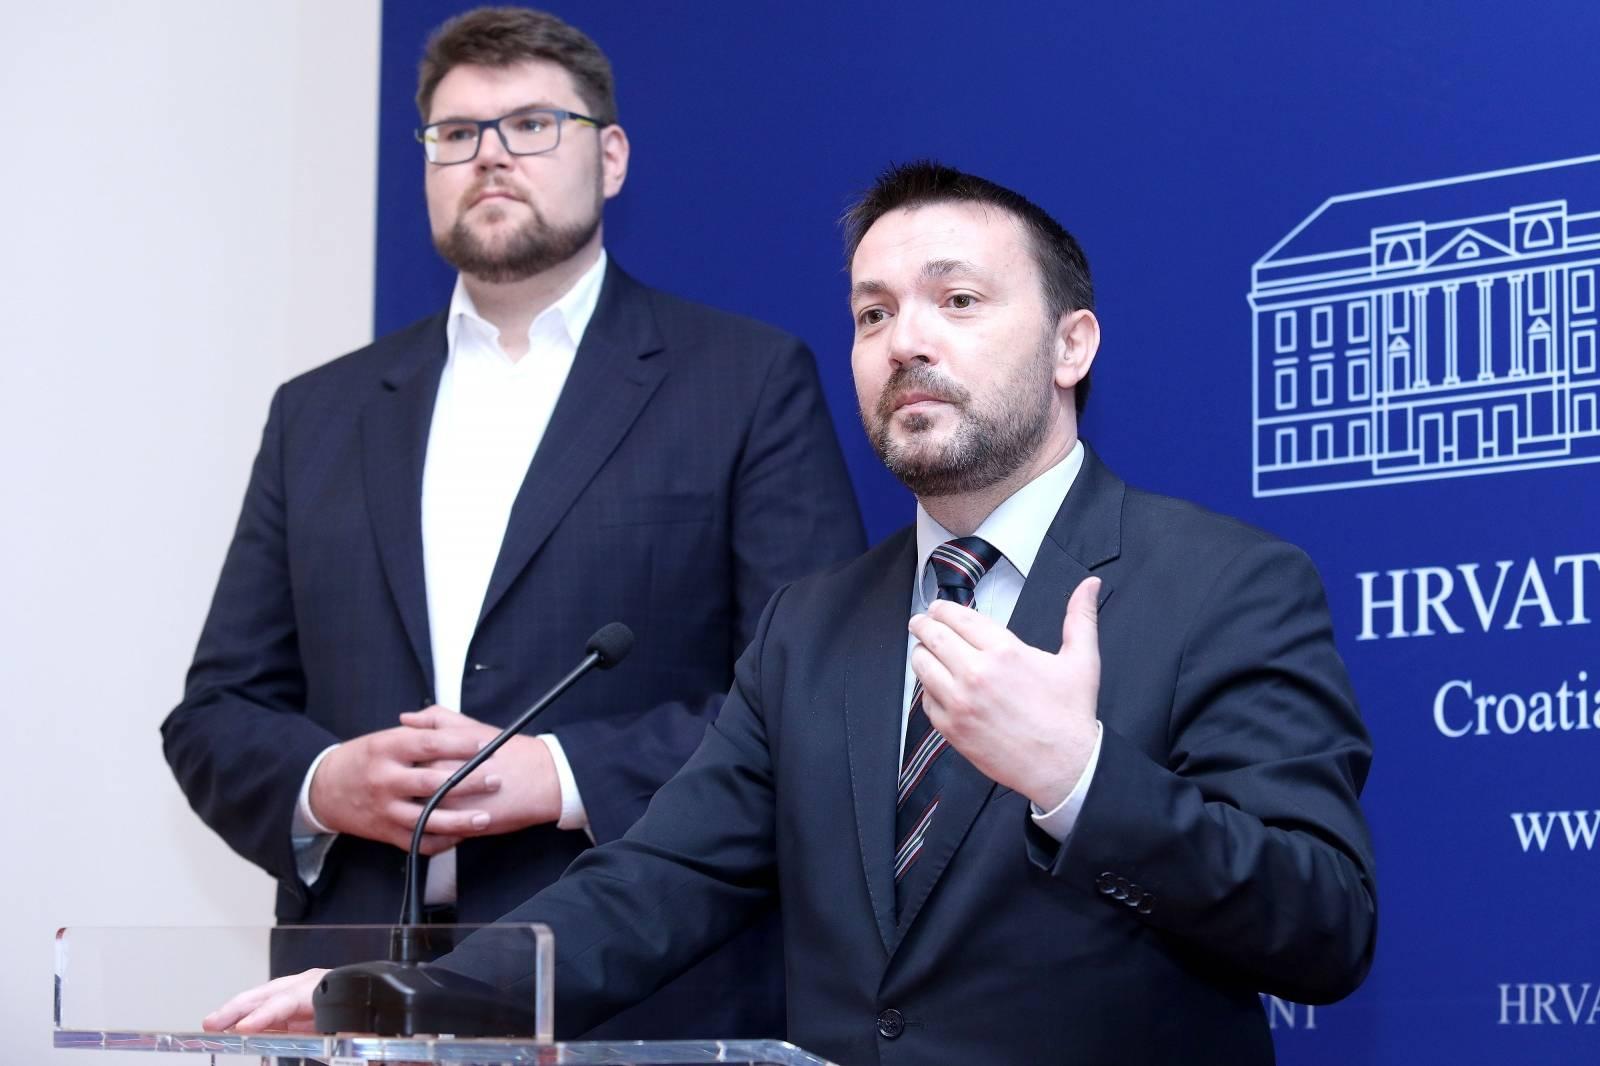 Zagreb: Arsen Bauk i Peđa Grbin govorili o sukobu interesa